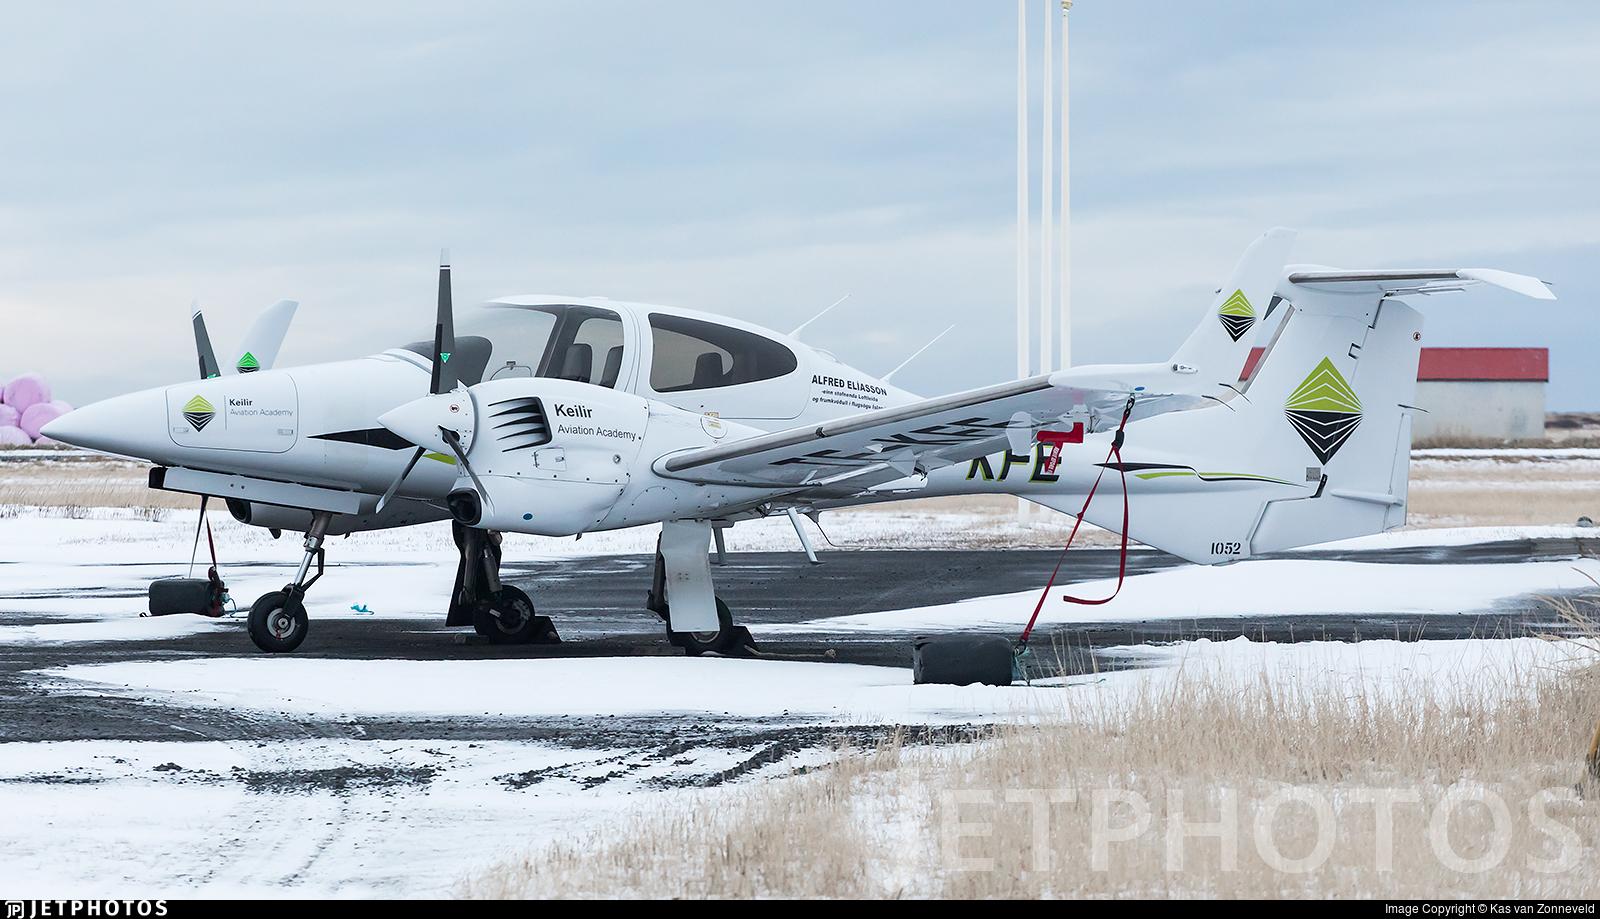 TF-KFE - Diamond DA-42 NG Twin Star - Keilir Aviation Academy